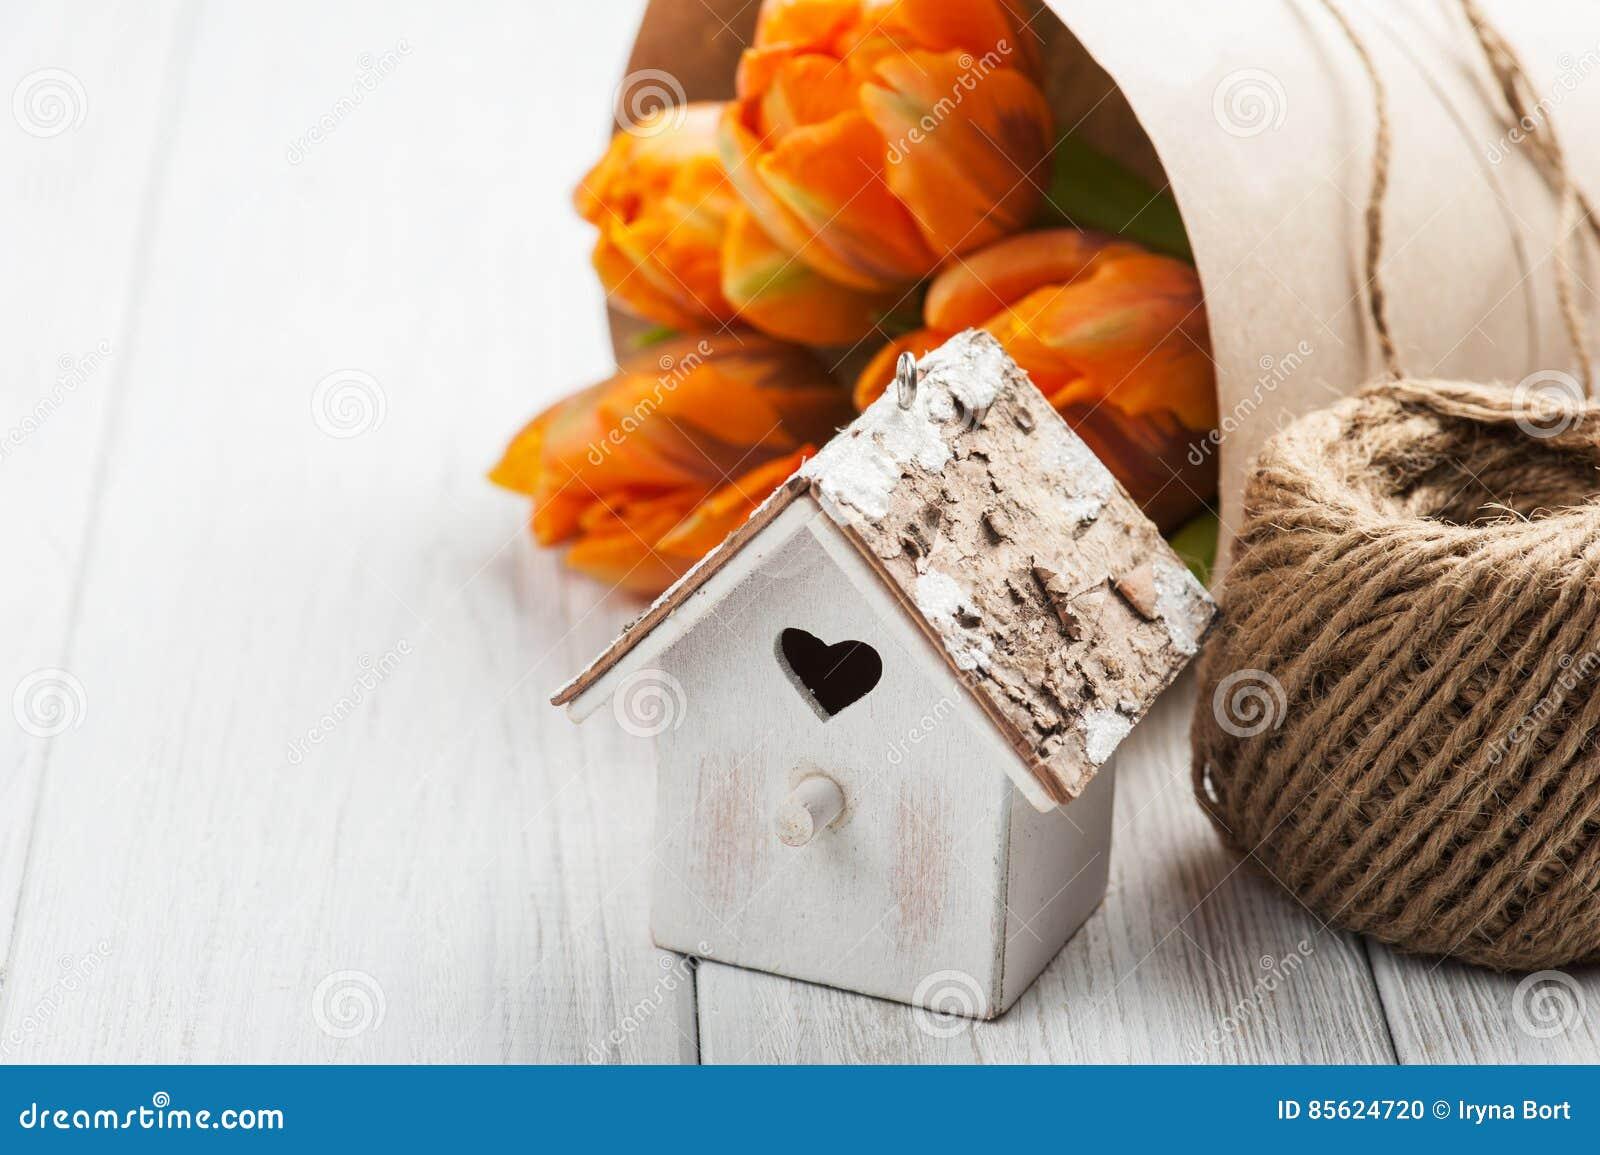 Orange tulips, wooden heart shape bird house and twine